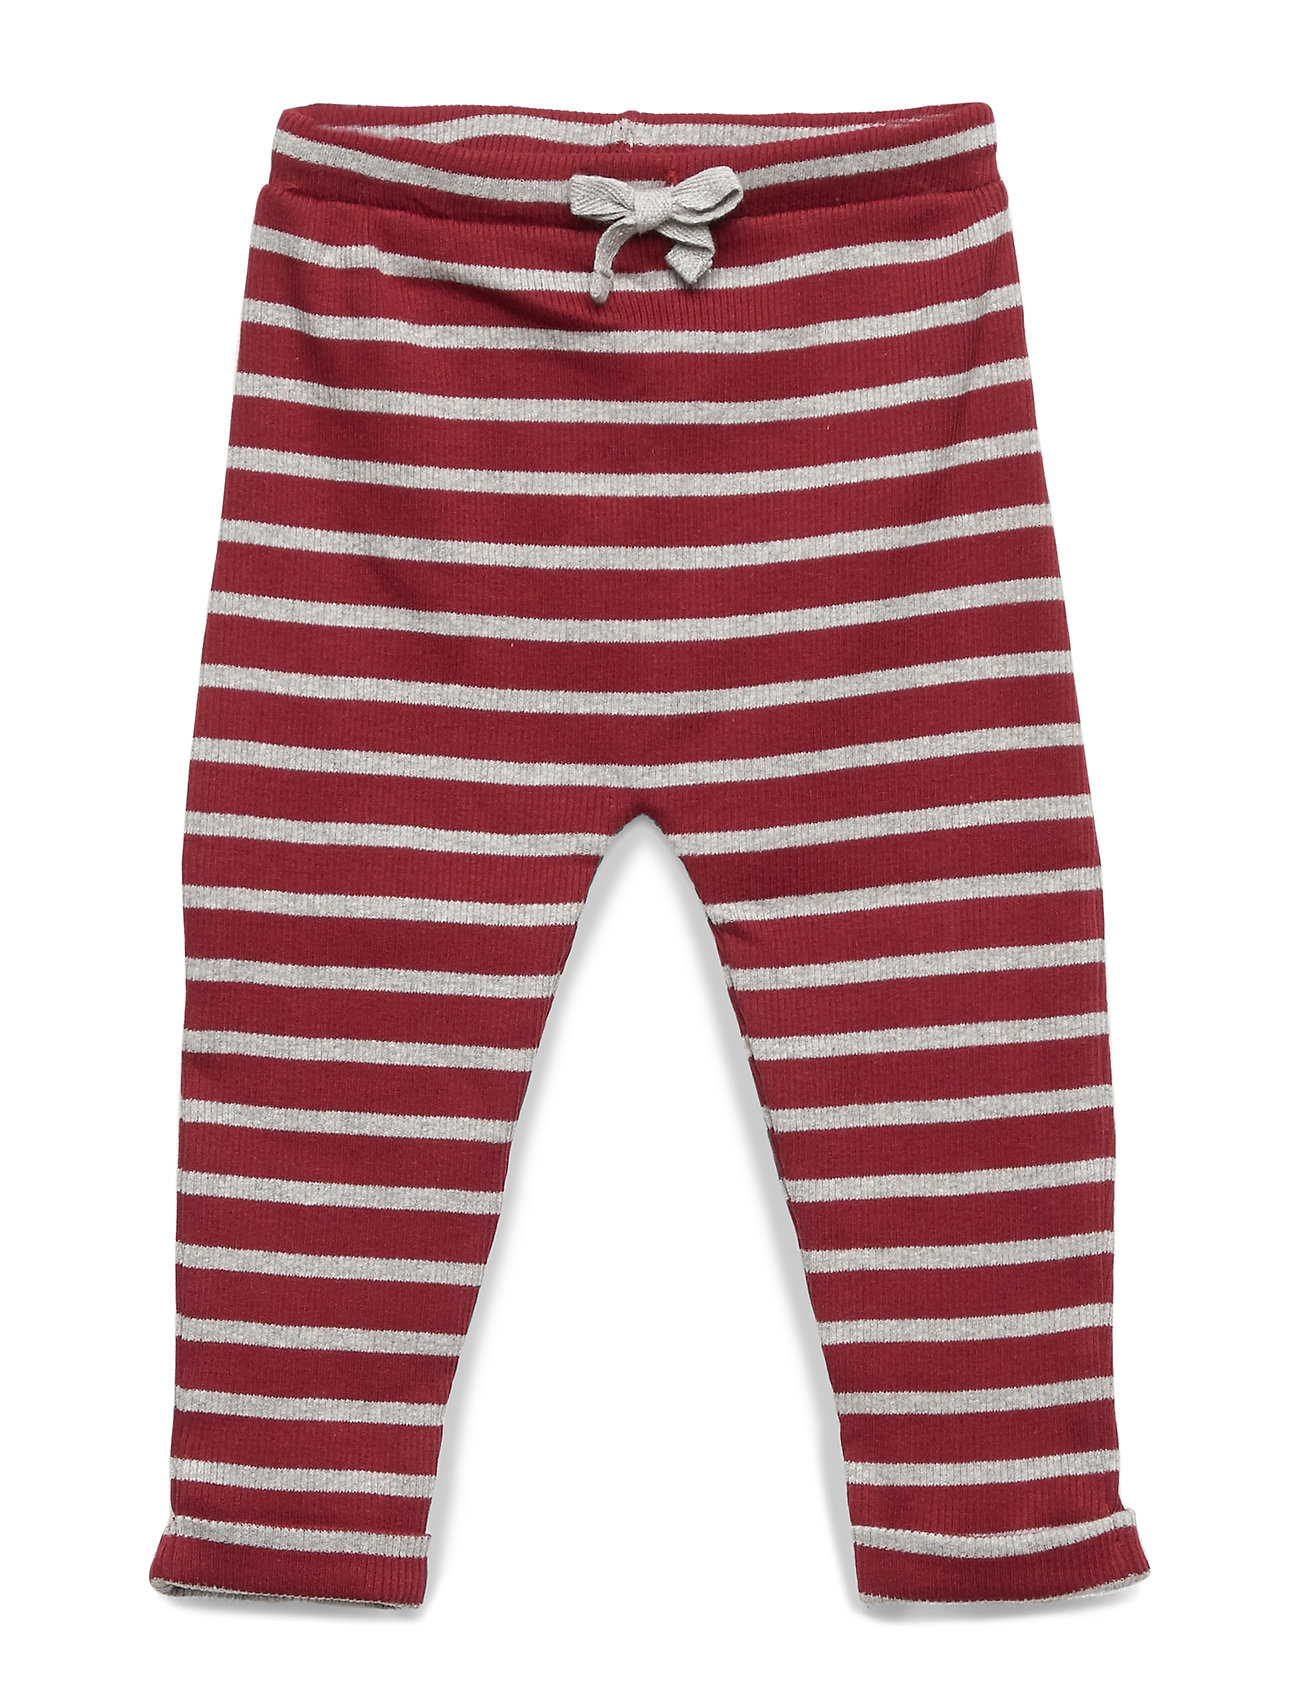 Noa Noa Miniature Trousers - RHUBARB